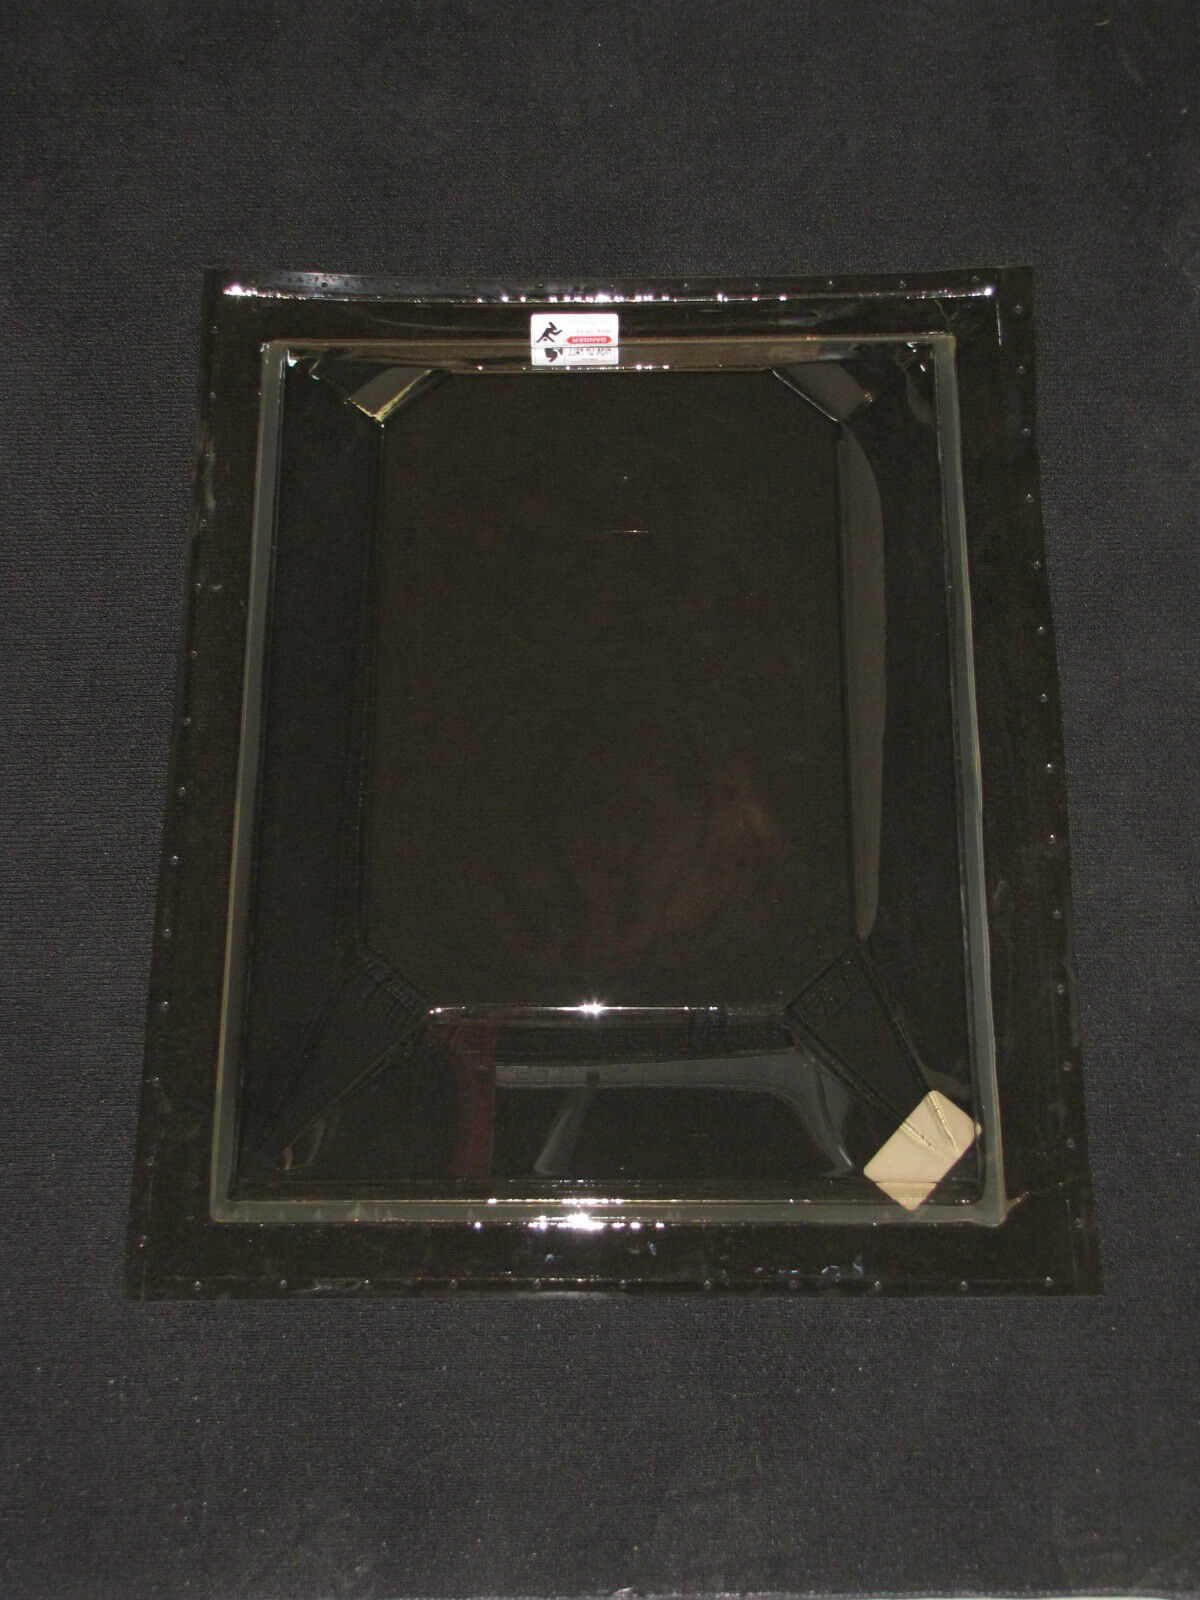 Mobile Home Skylight 24x32 22x30 Double Pane Sapphire Dome Self Flashing